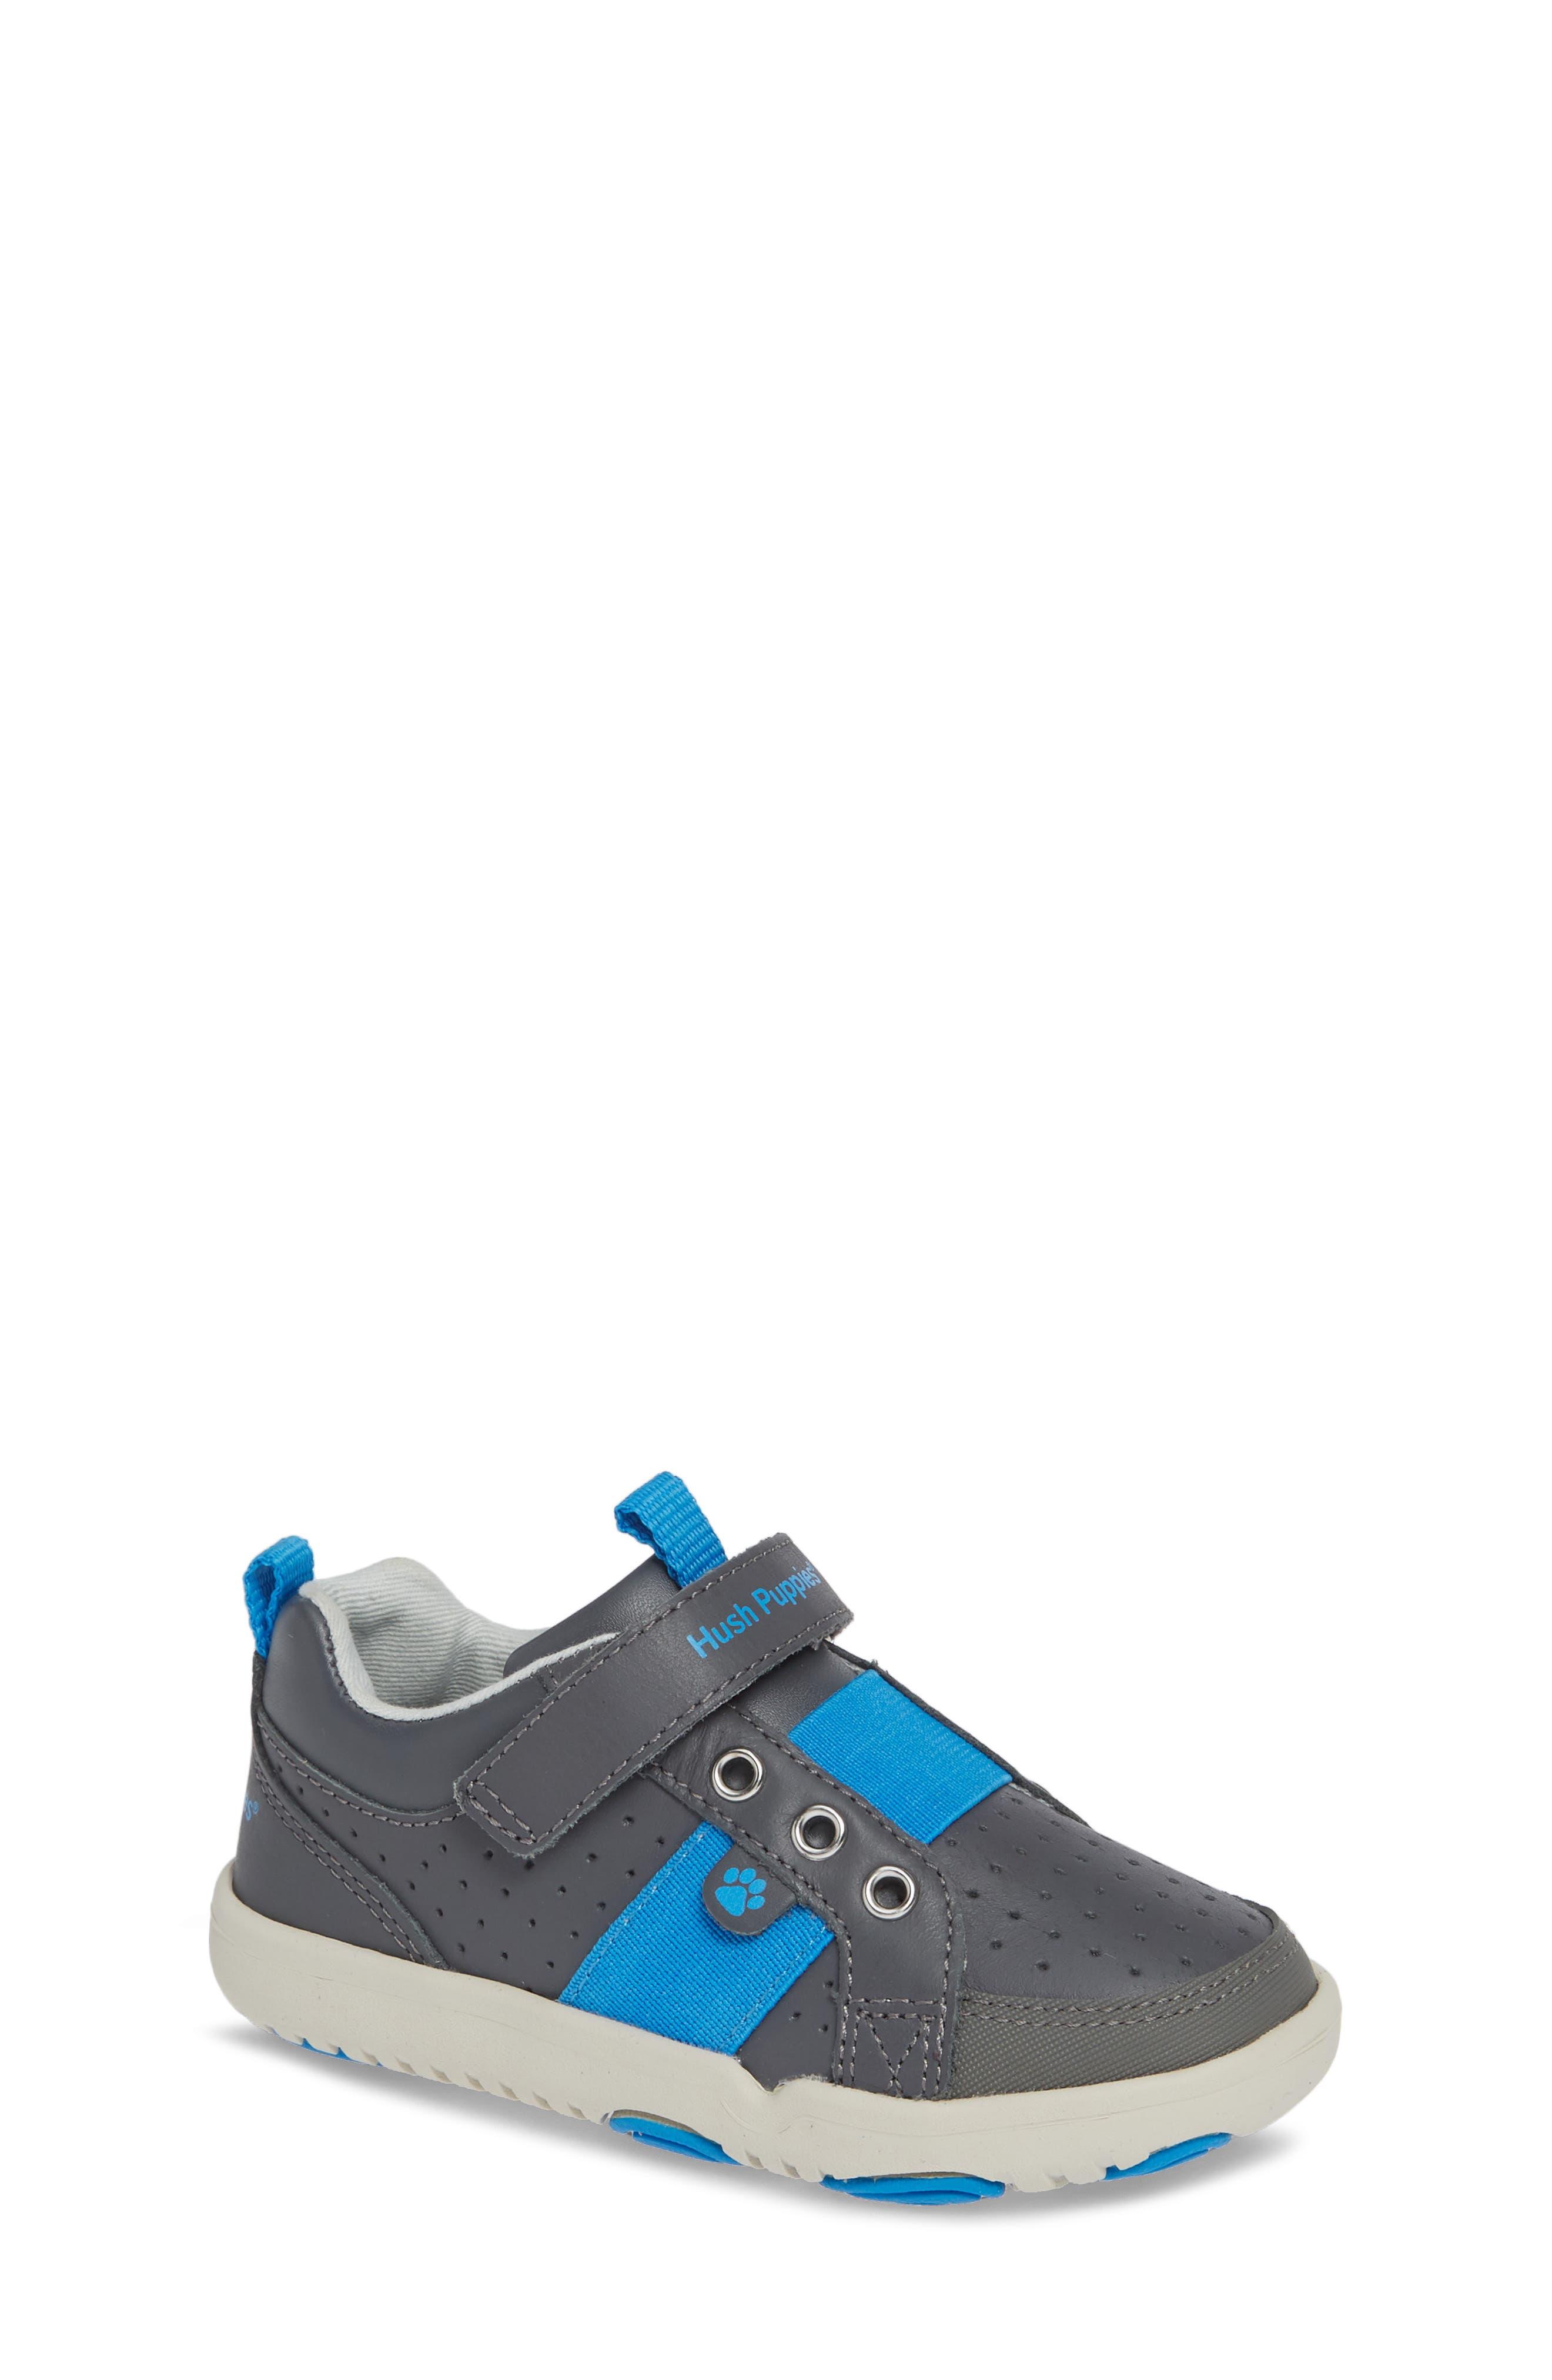 Jesse Sneaker,                             Main thumbnail 1, color,                             GREY